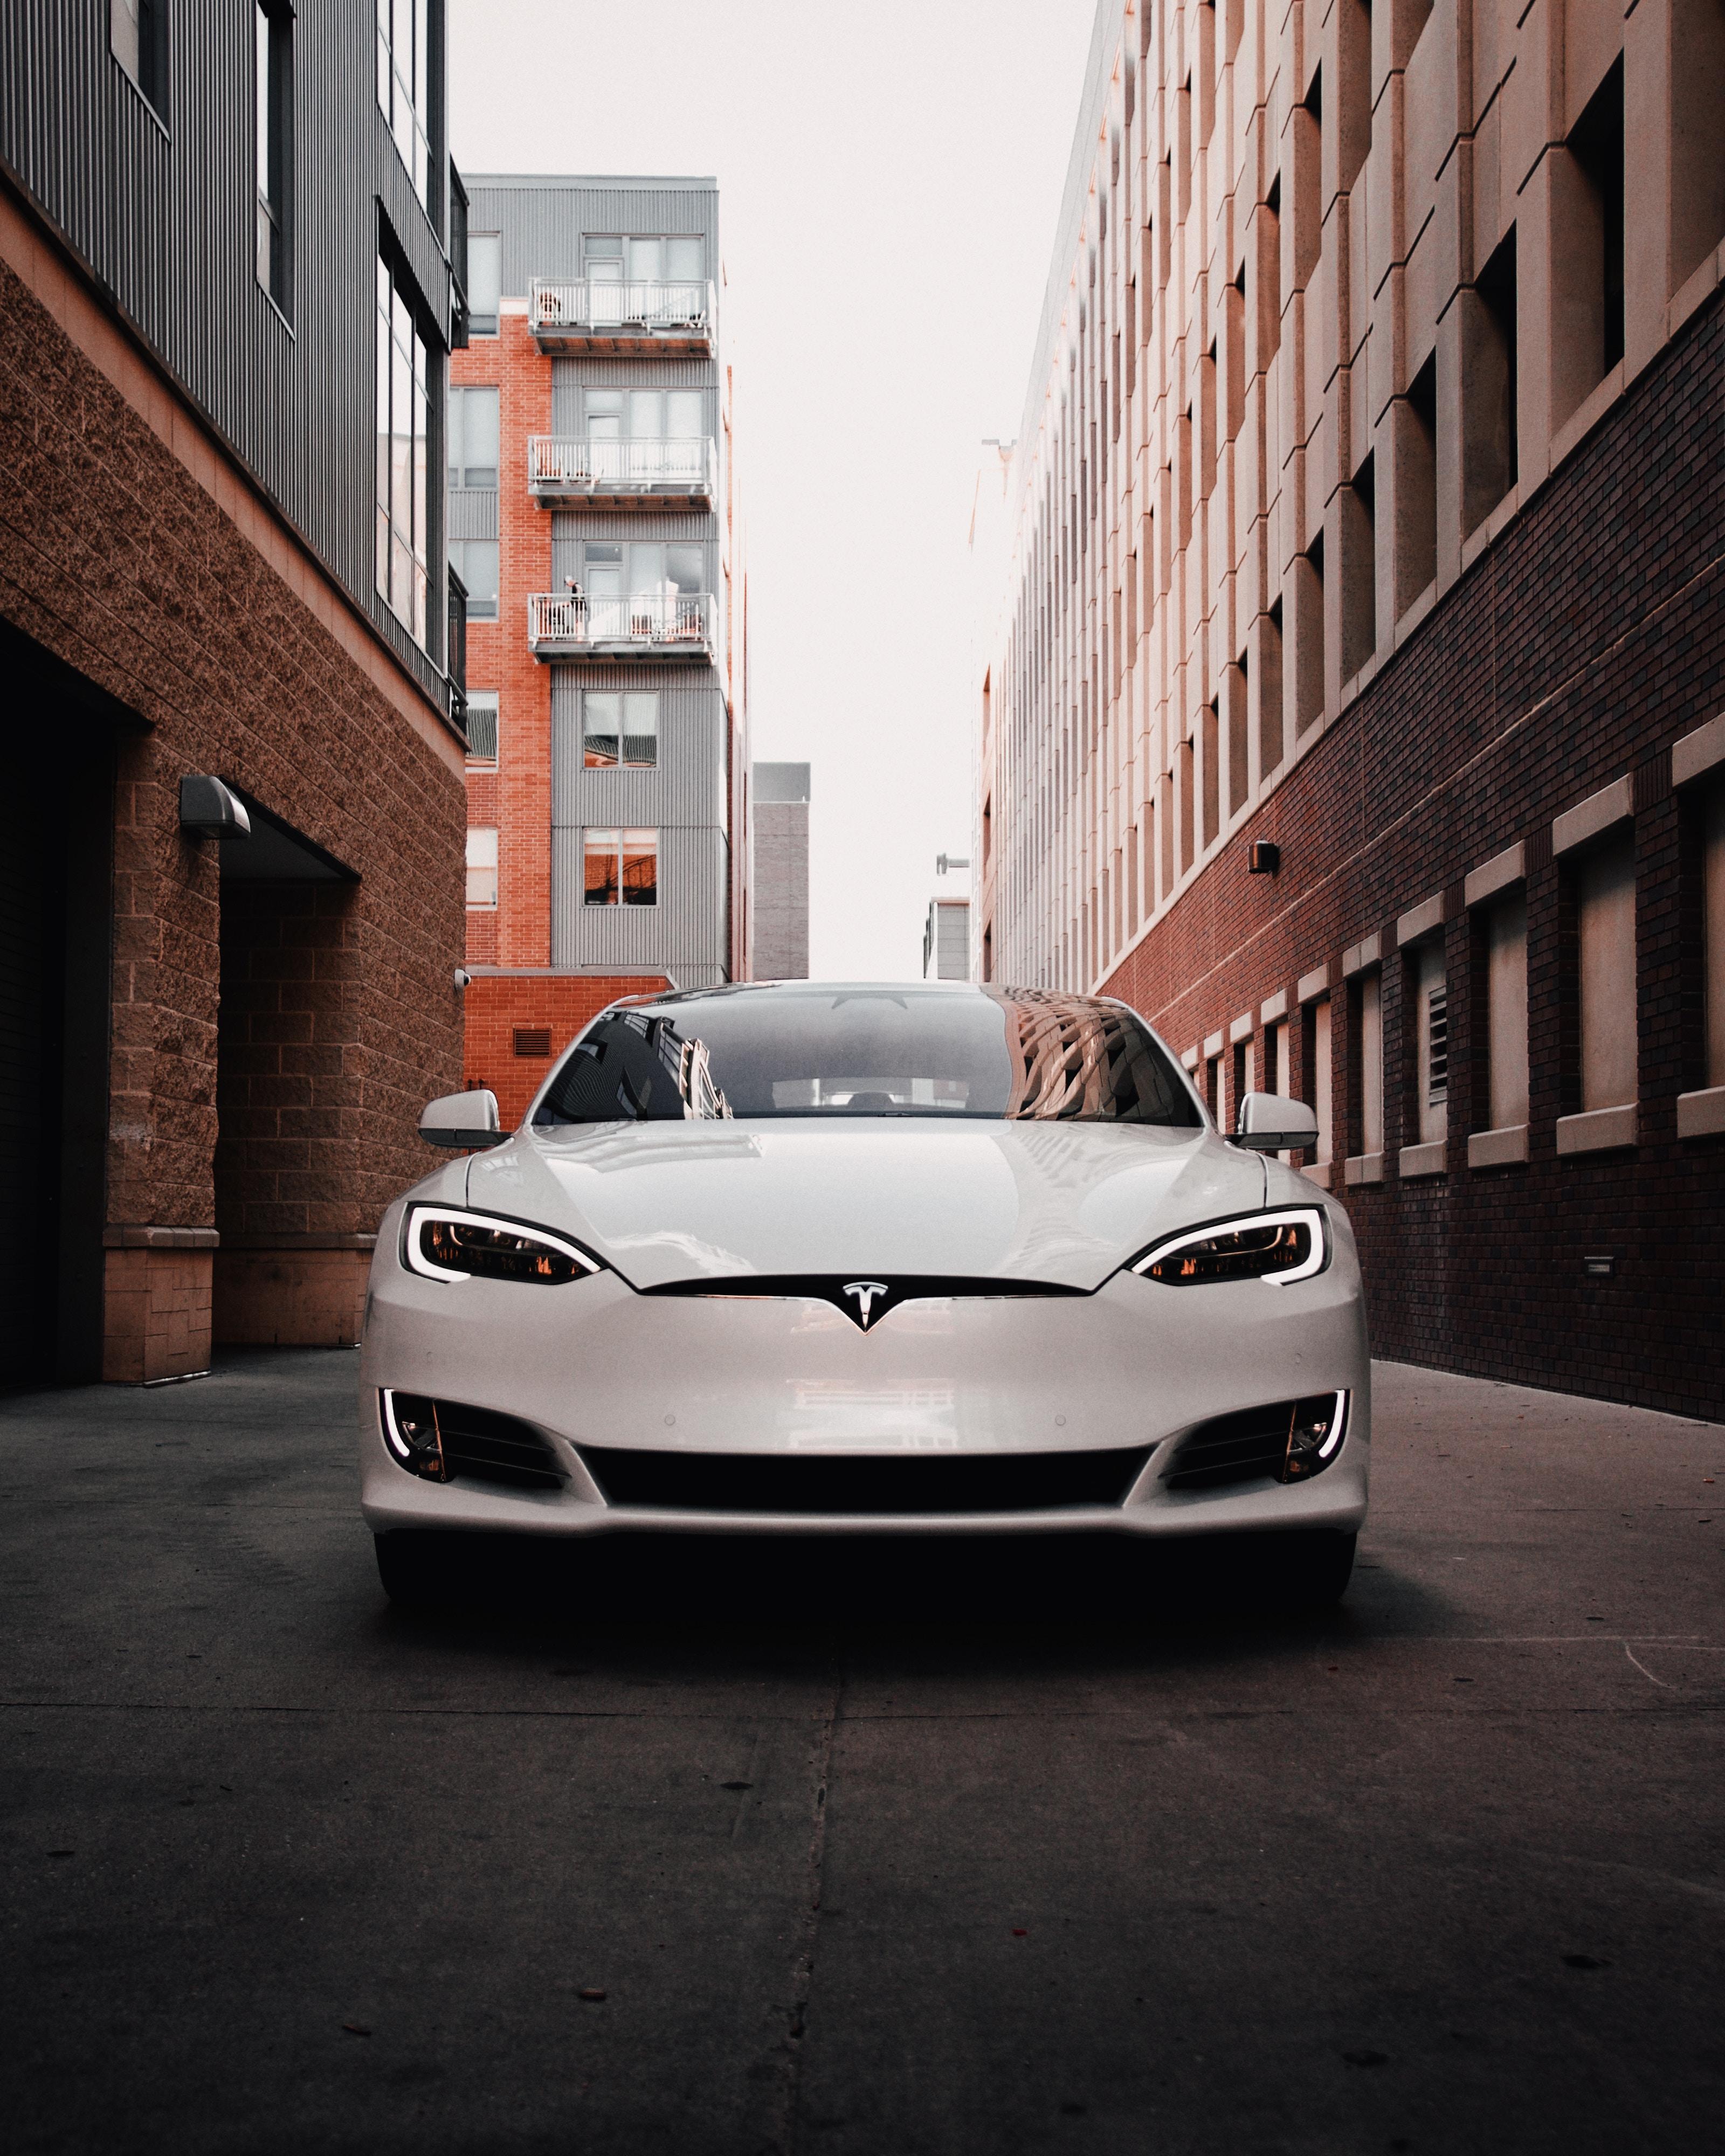 70937 Заставки и Обои Вид Спереди на телефон. Скачать Электрокар, Tesla, Tesla Model S, Тачки (Cars), Вид Спереди, Машина, Белый картинки бесплатно